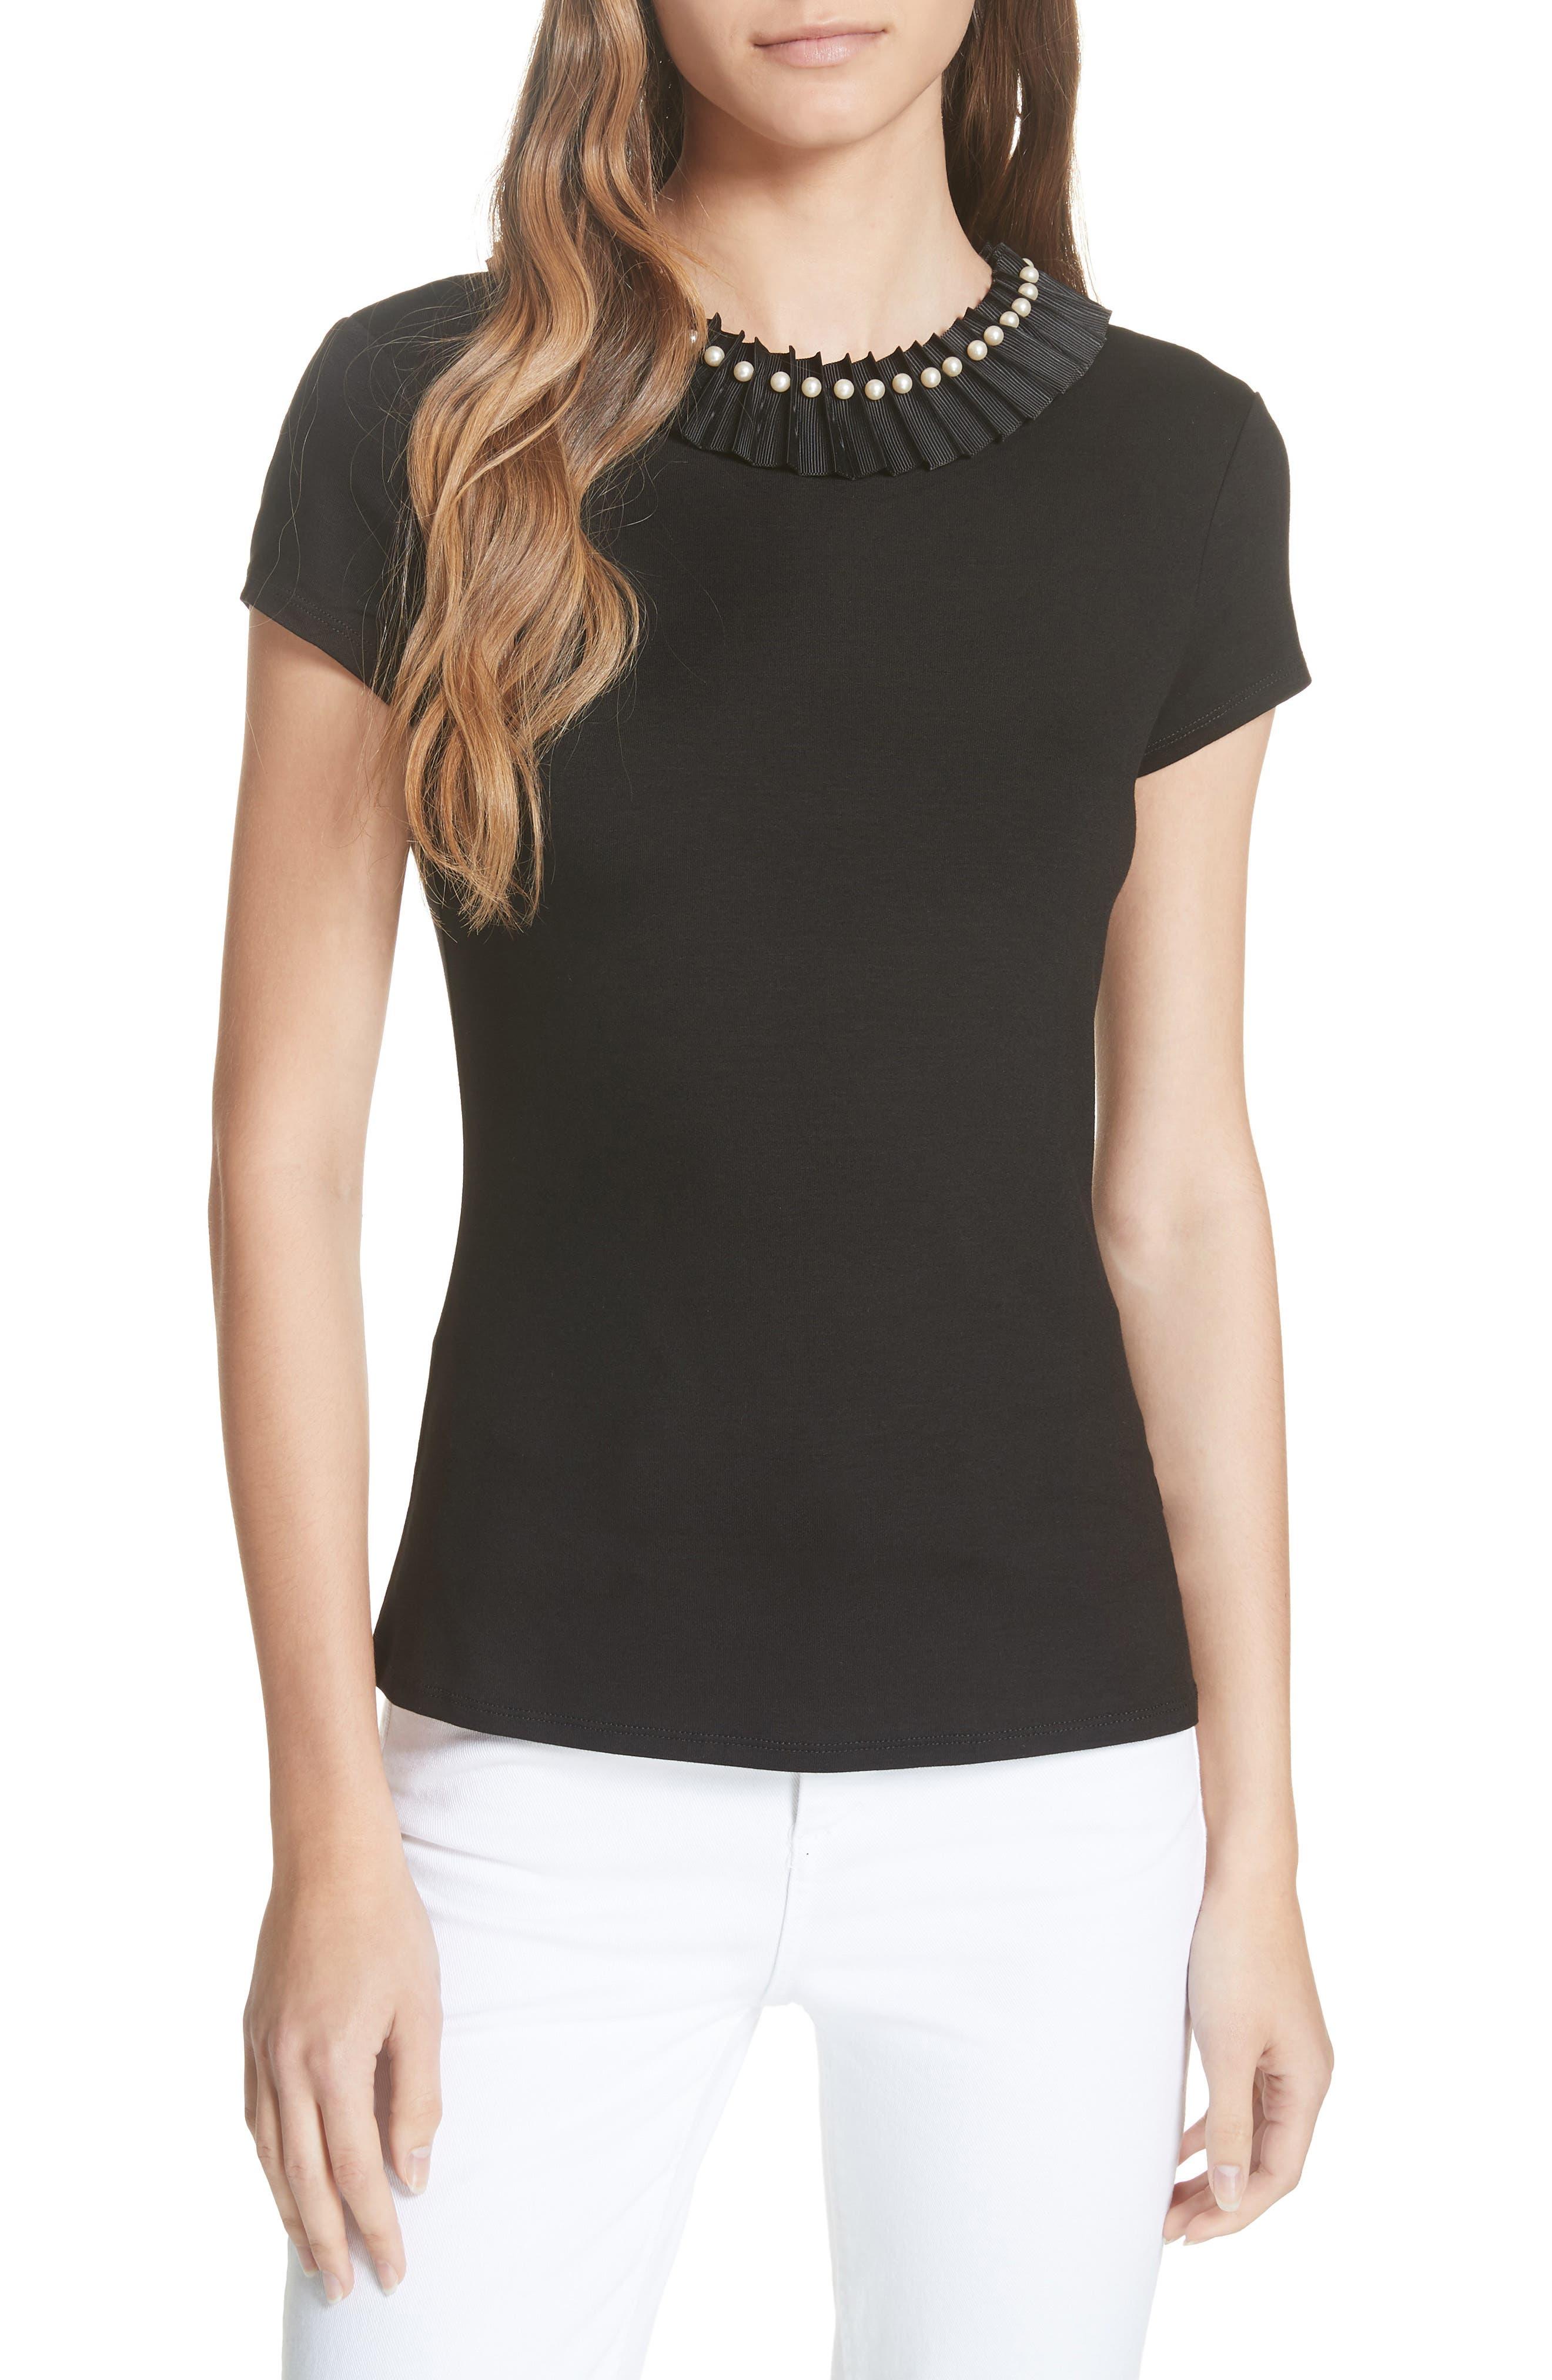 Nickita Imitation Pearl Neck Top,                         Main,                         color, BLACK